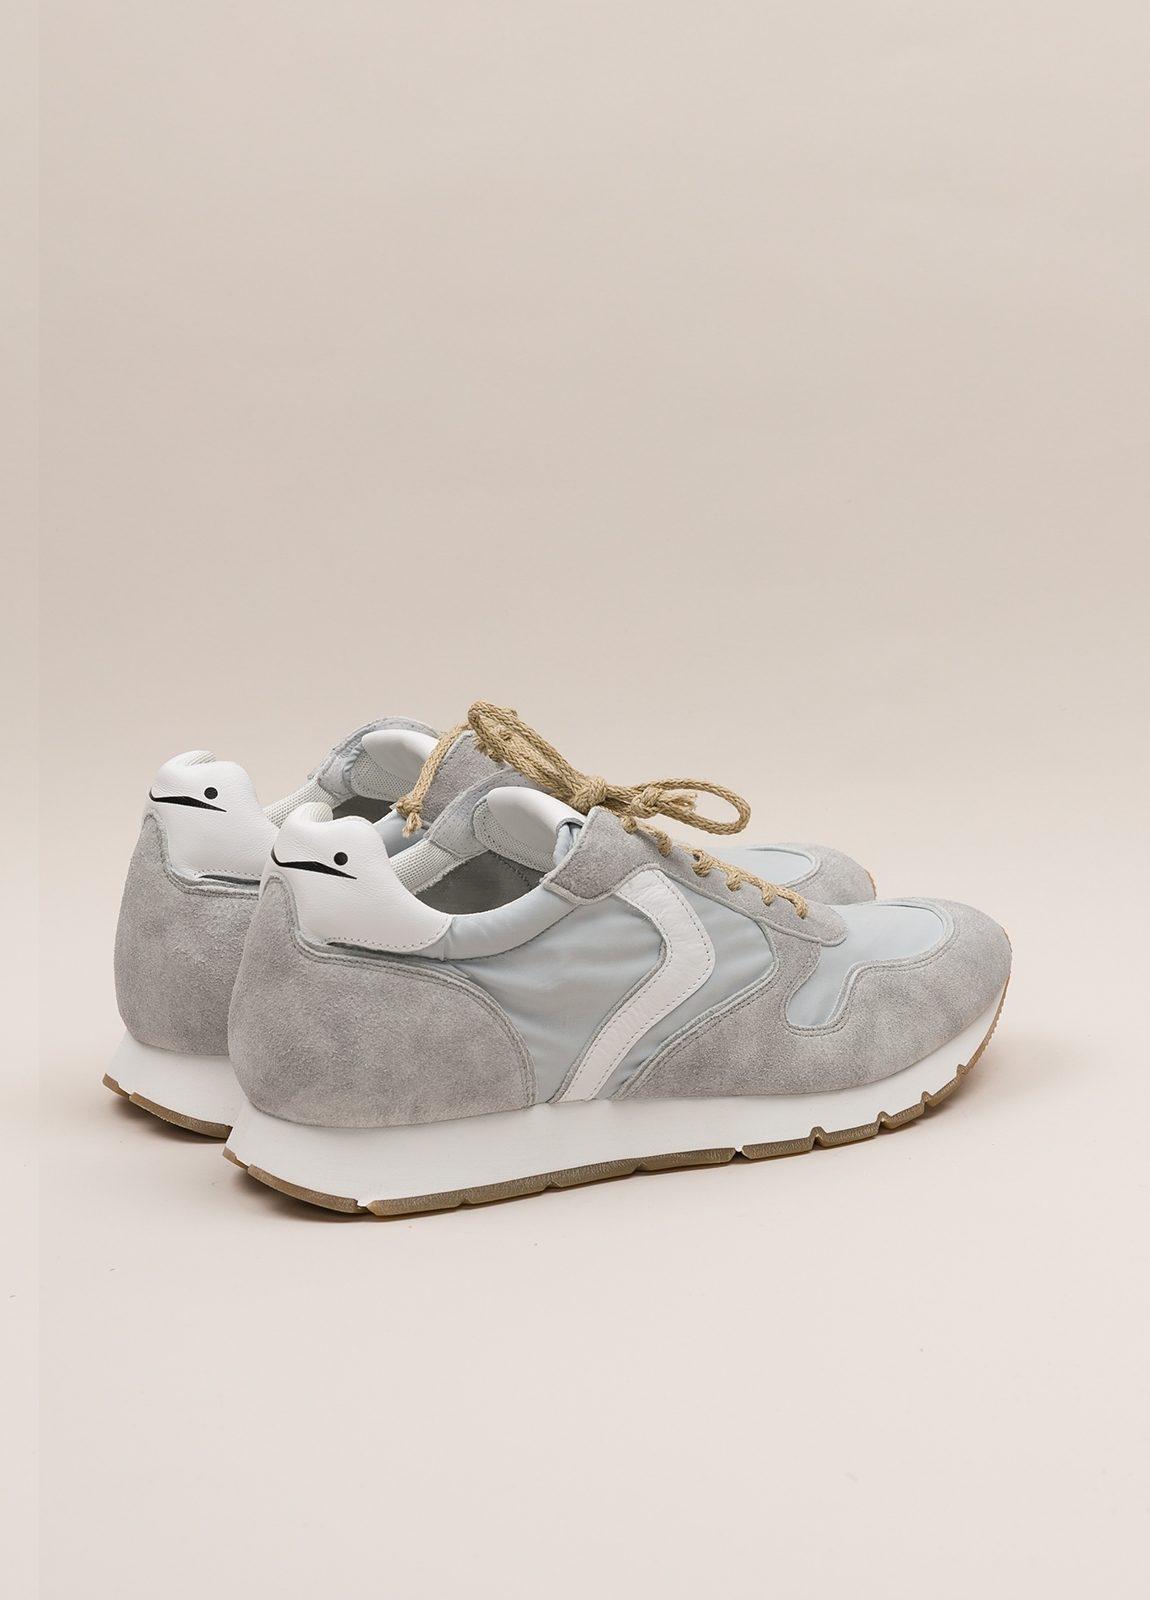 Zapatillas casual VOILE BLANCHE gris claro - Ítem4